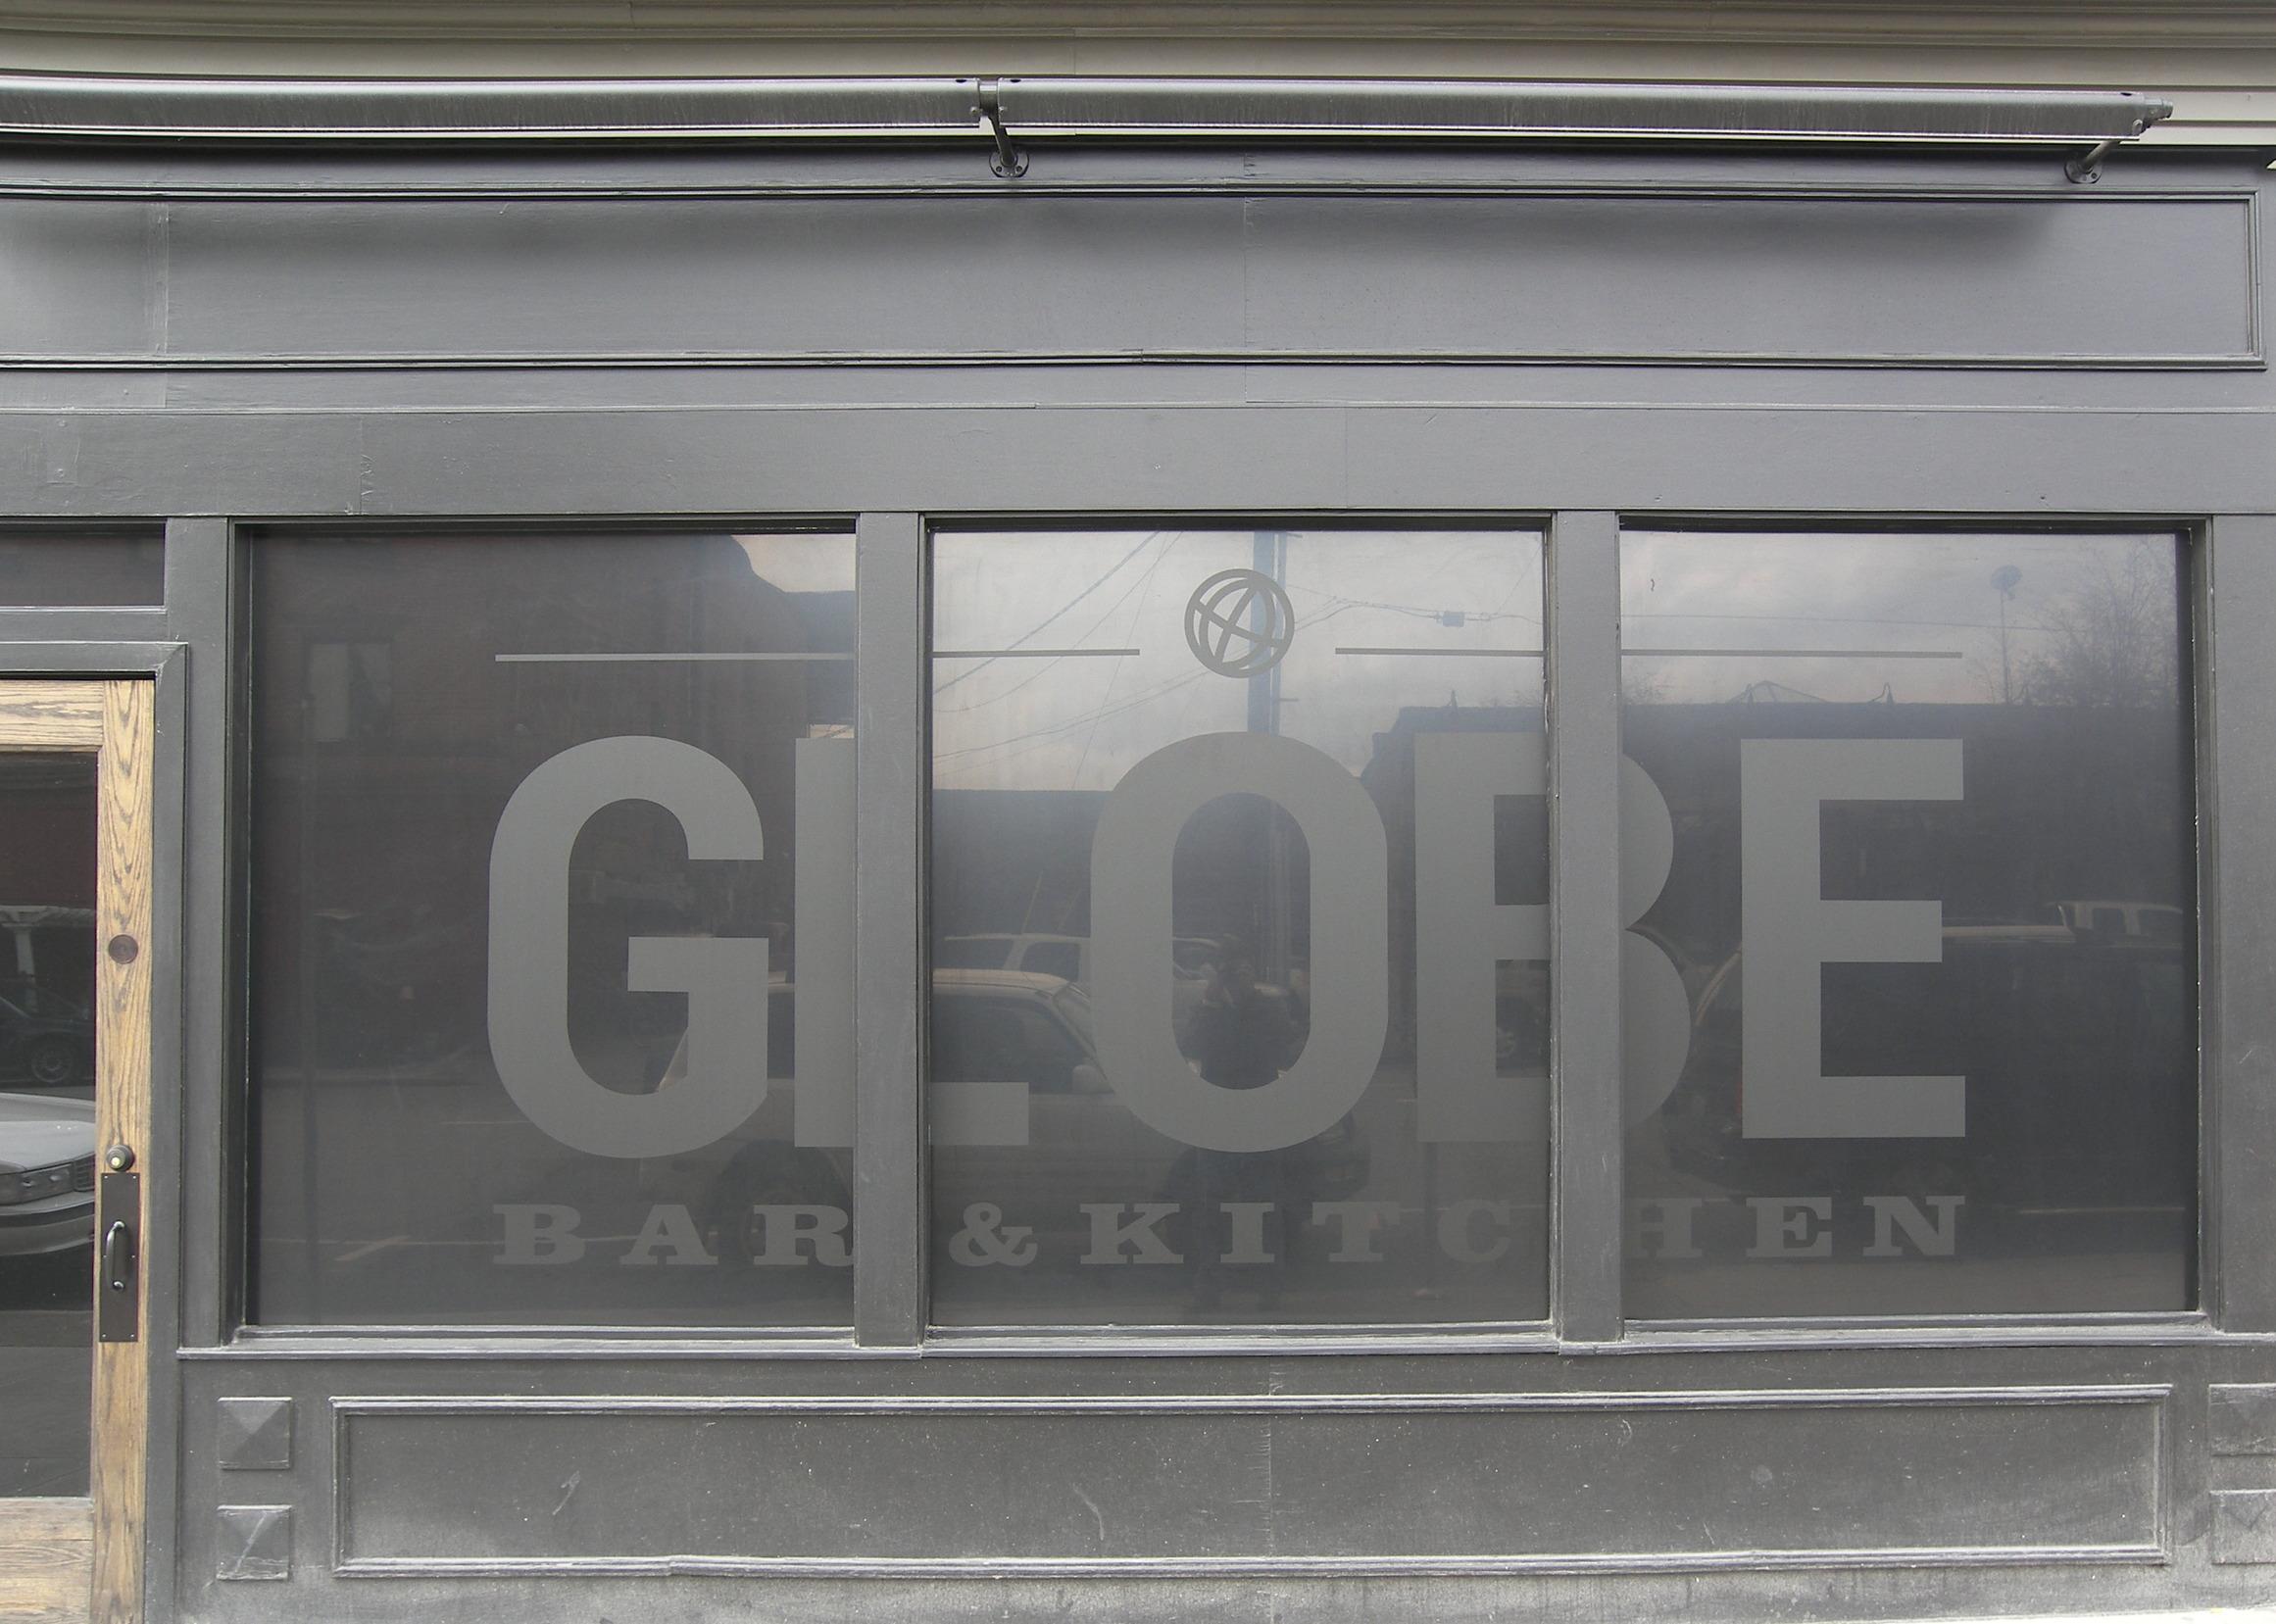 The Globe Window Graphics